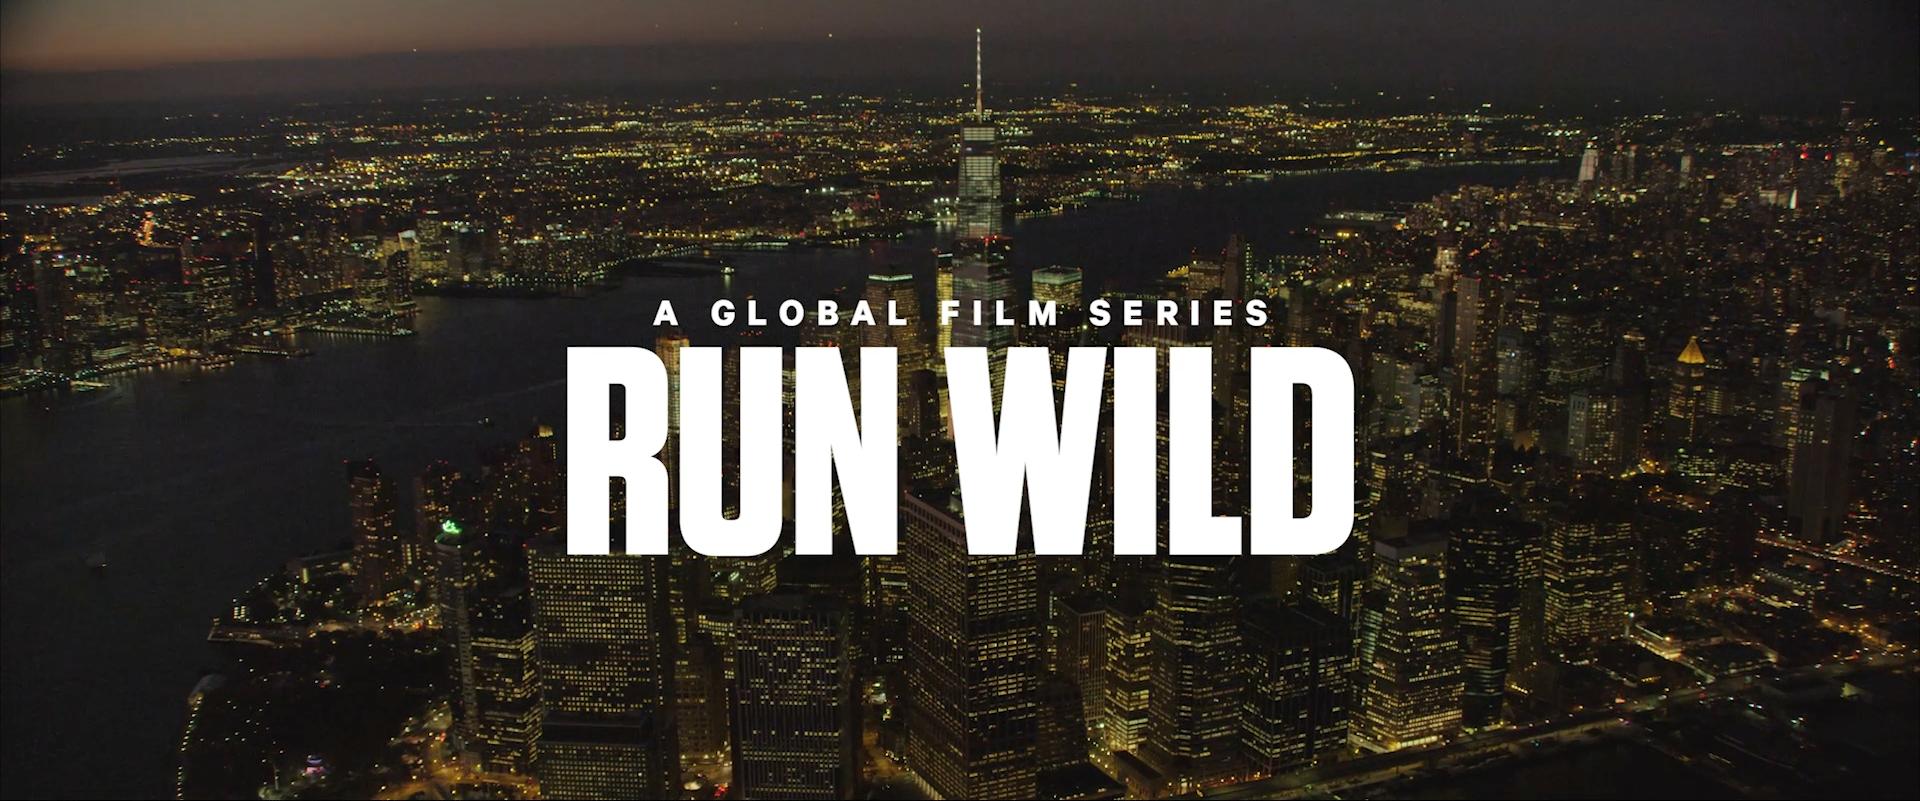 Thumbnail for Run Wild |Track 5: Grit